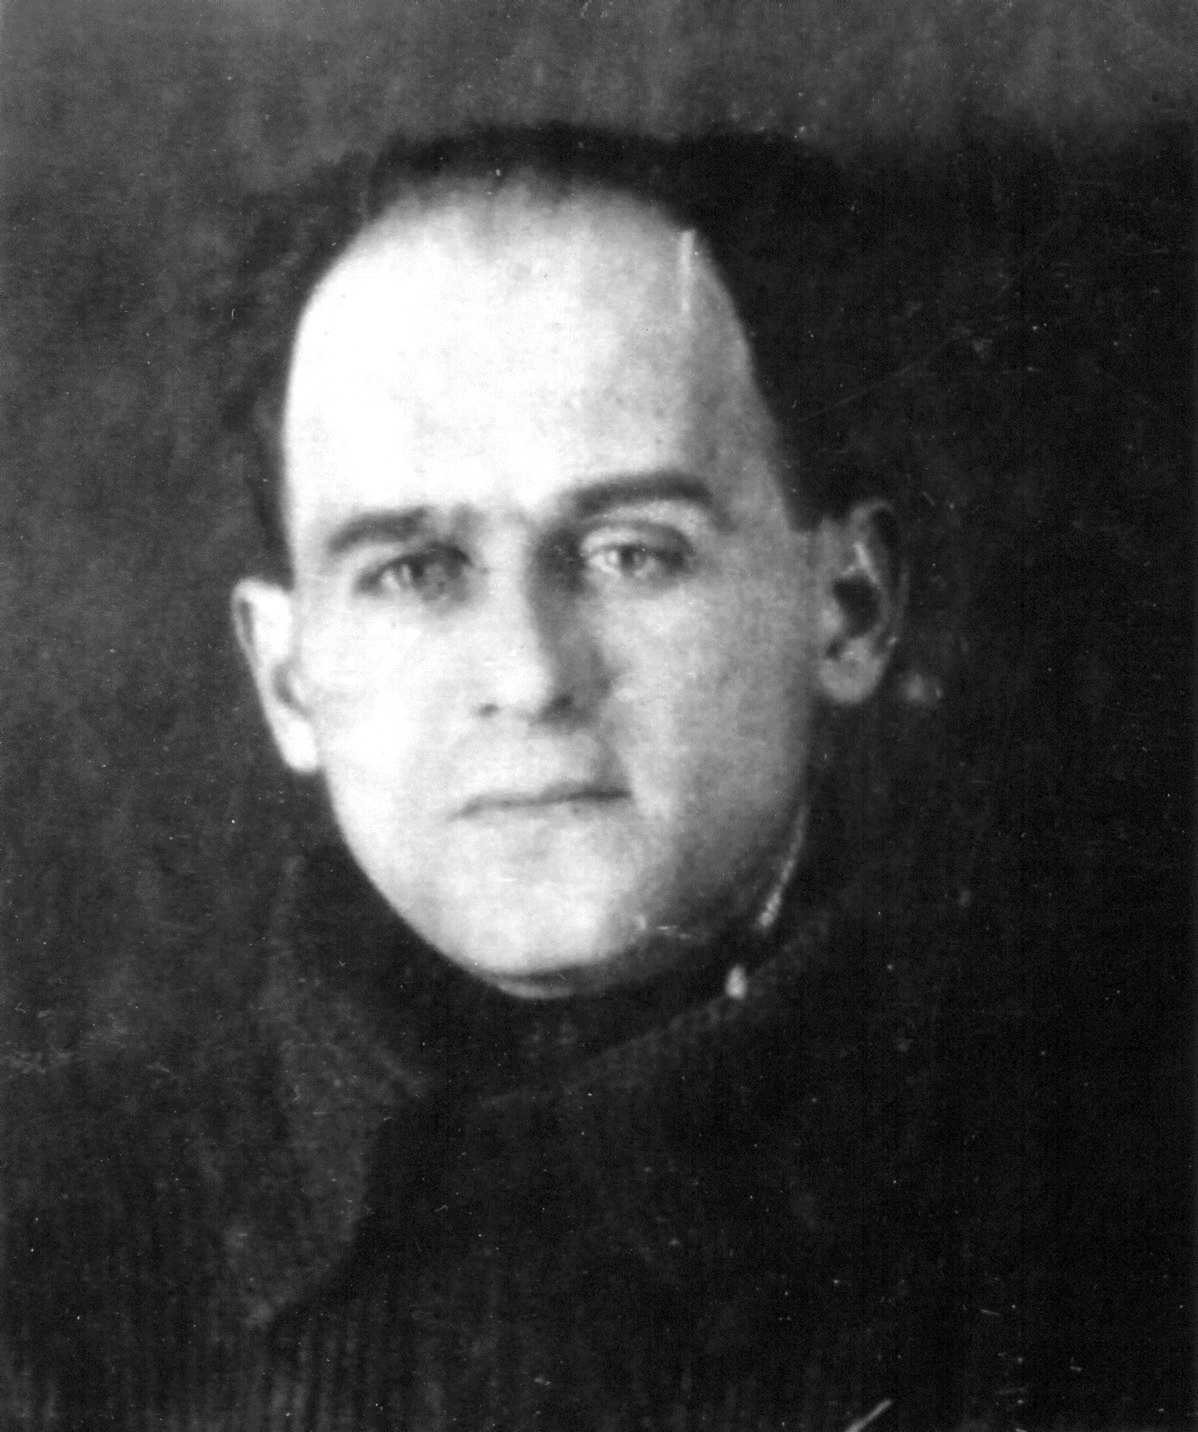 Amedeo Roccheggiani